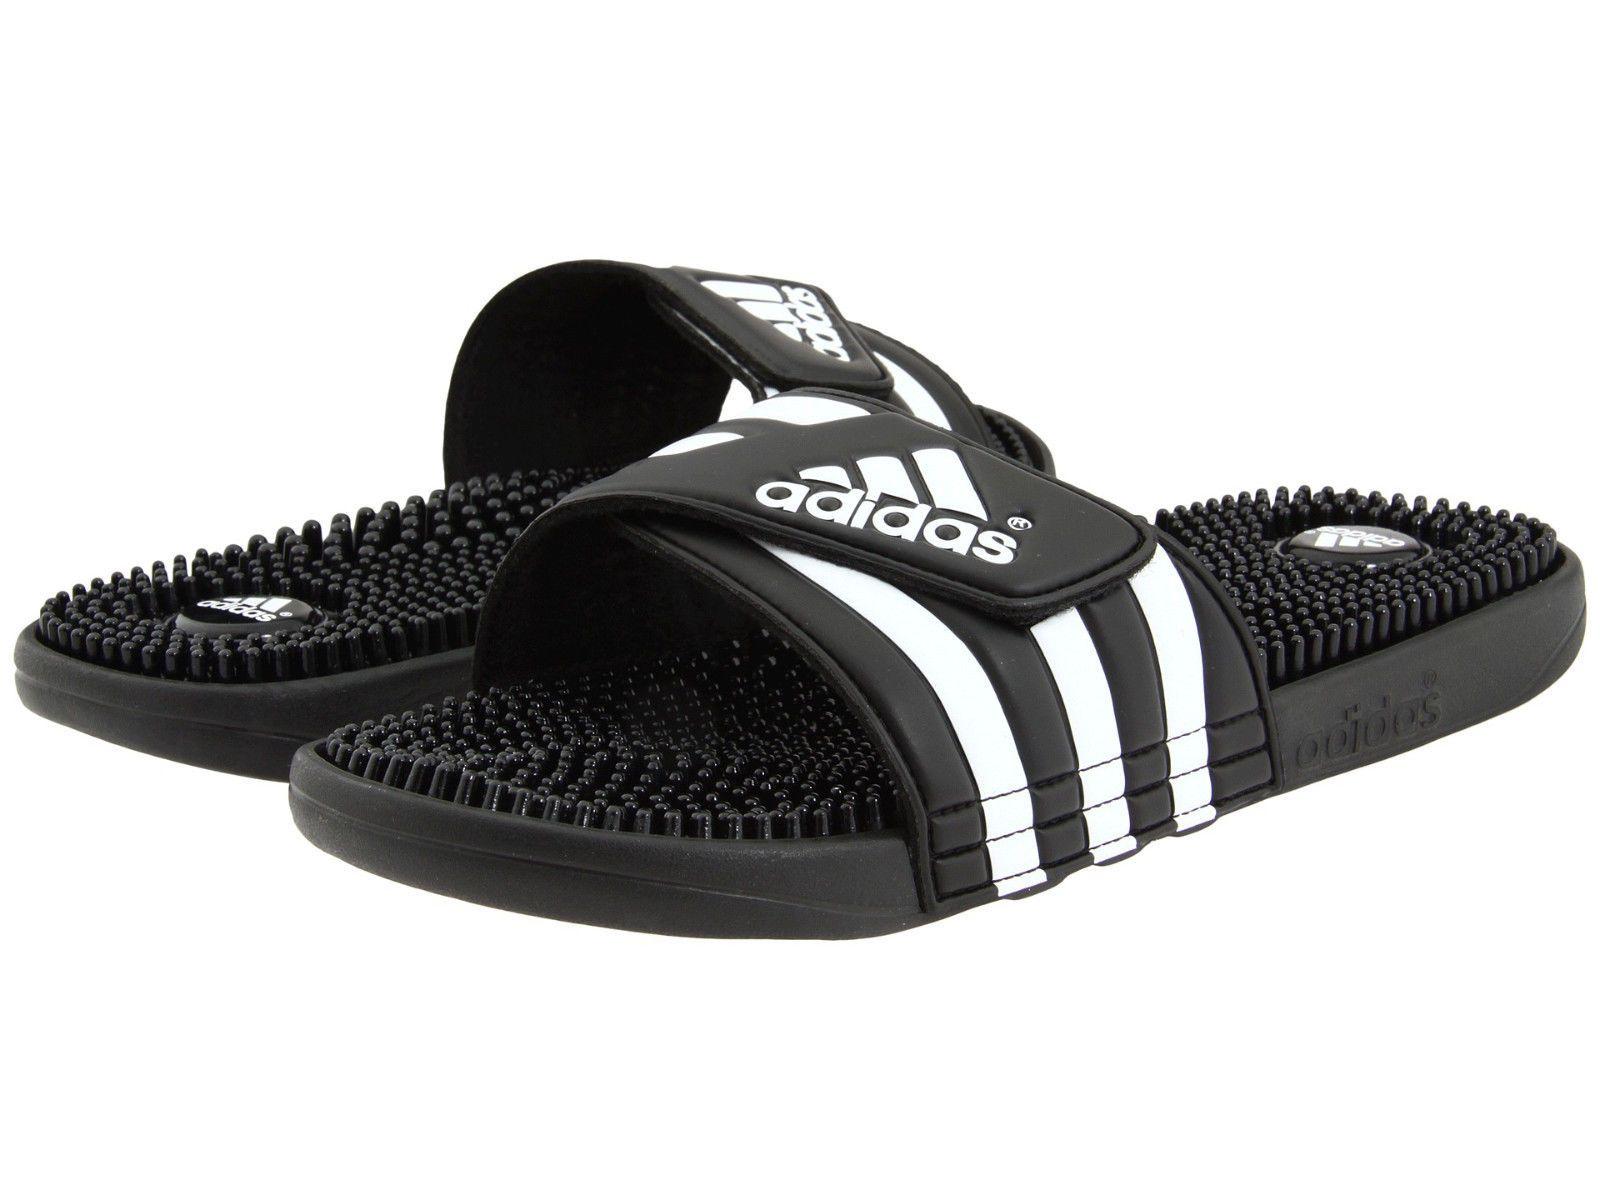 c55a4b21e42a Mens Adidas Adissage Black Slides Shower Sandals Athletic Sport 078260 Sz  6-15